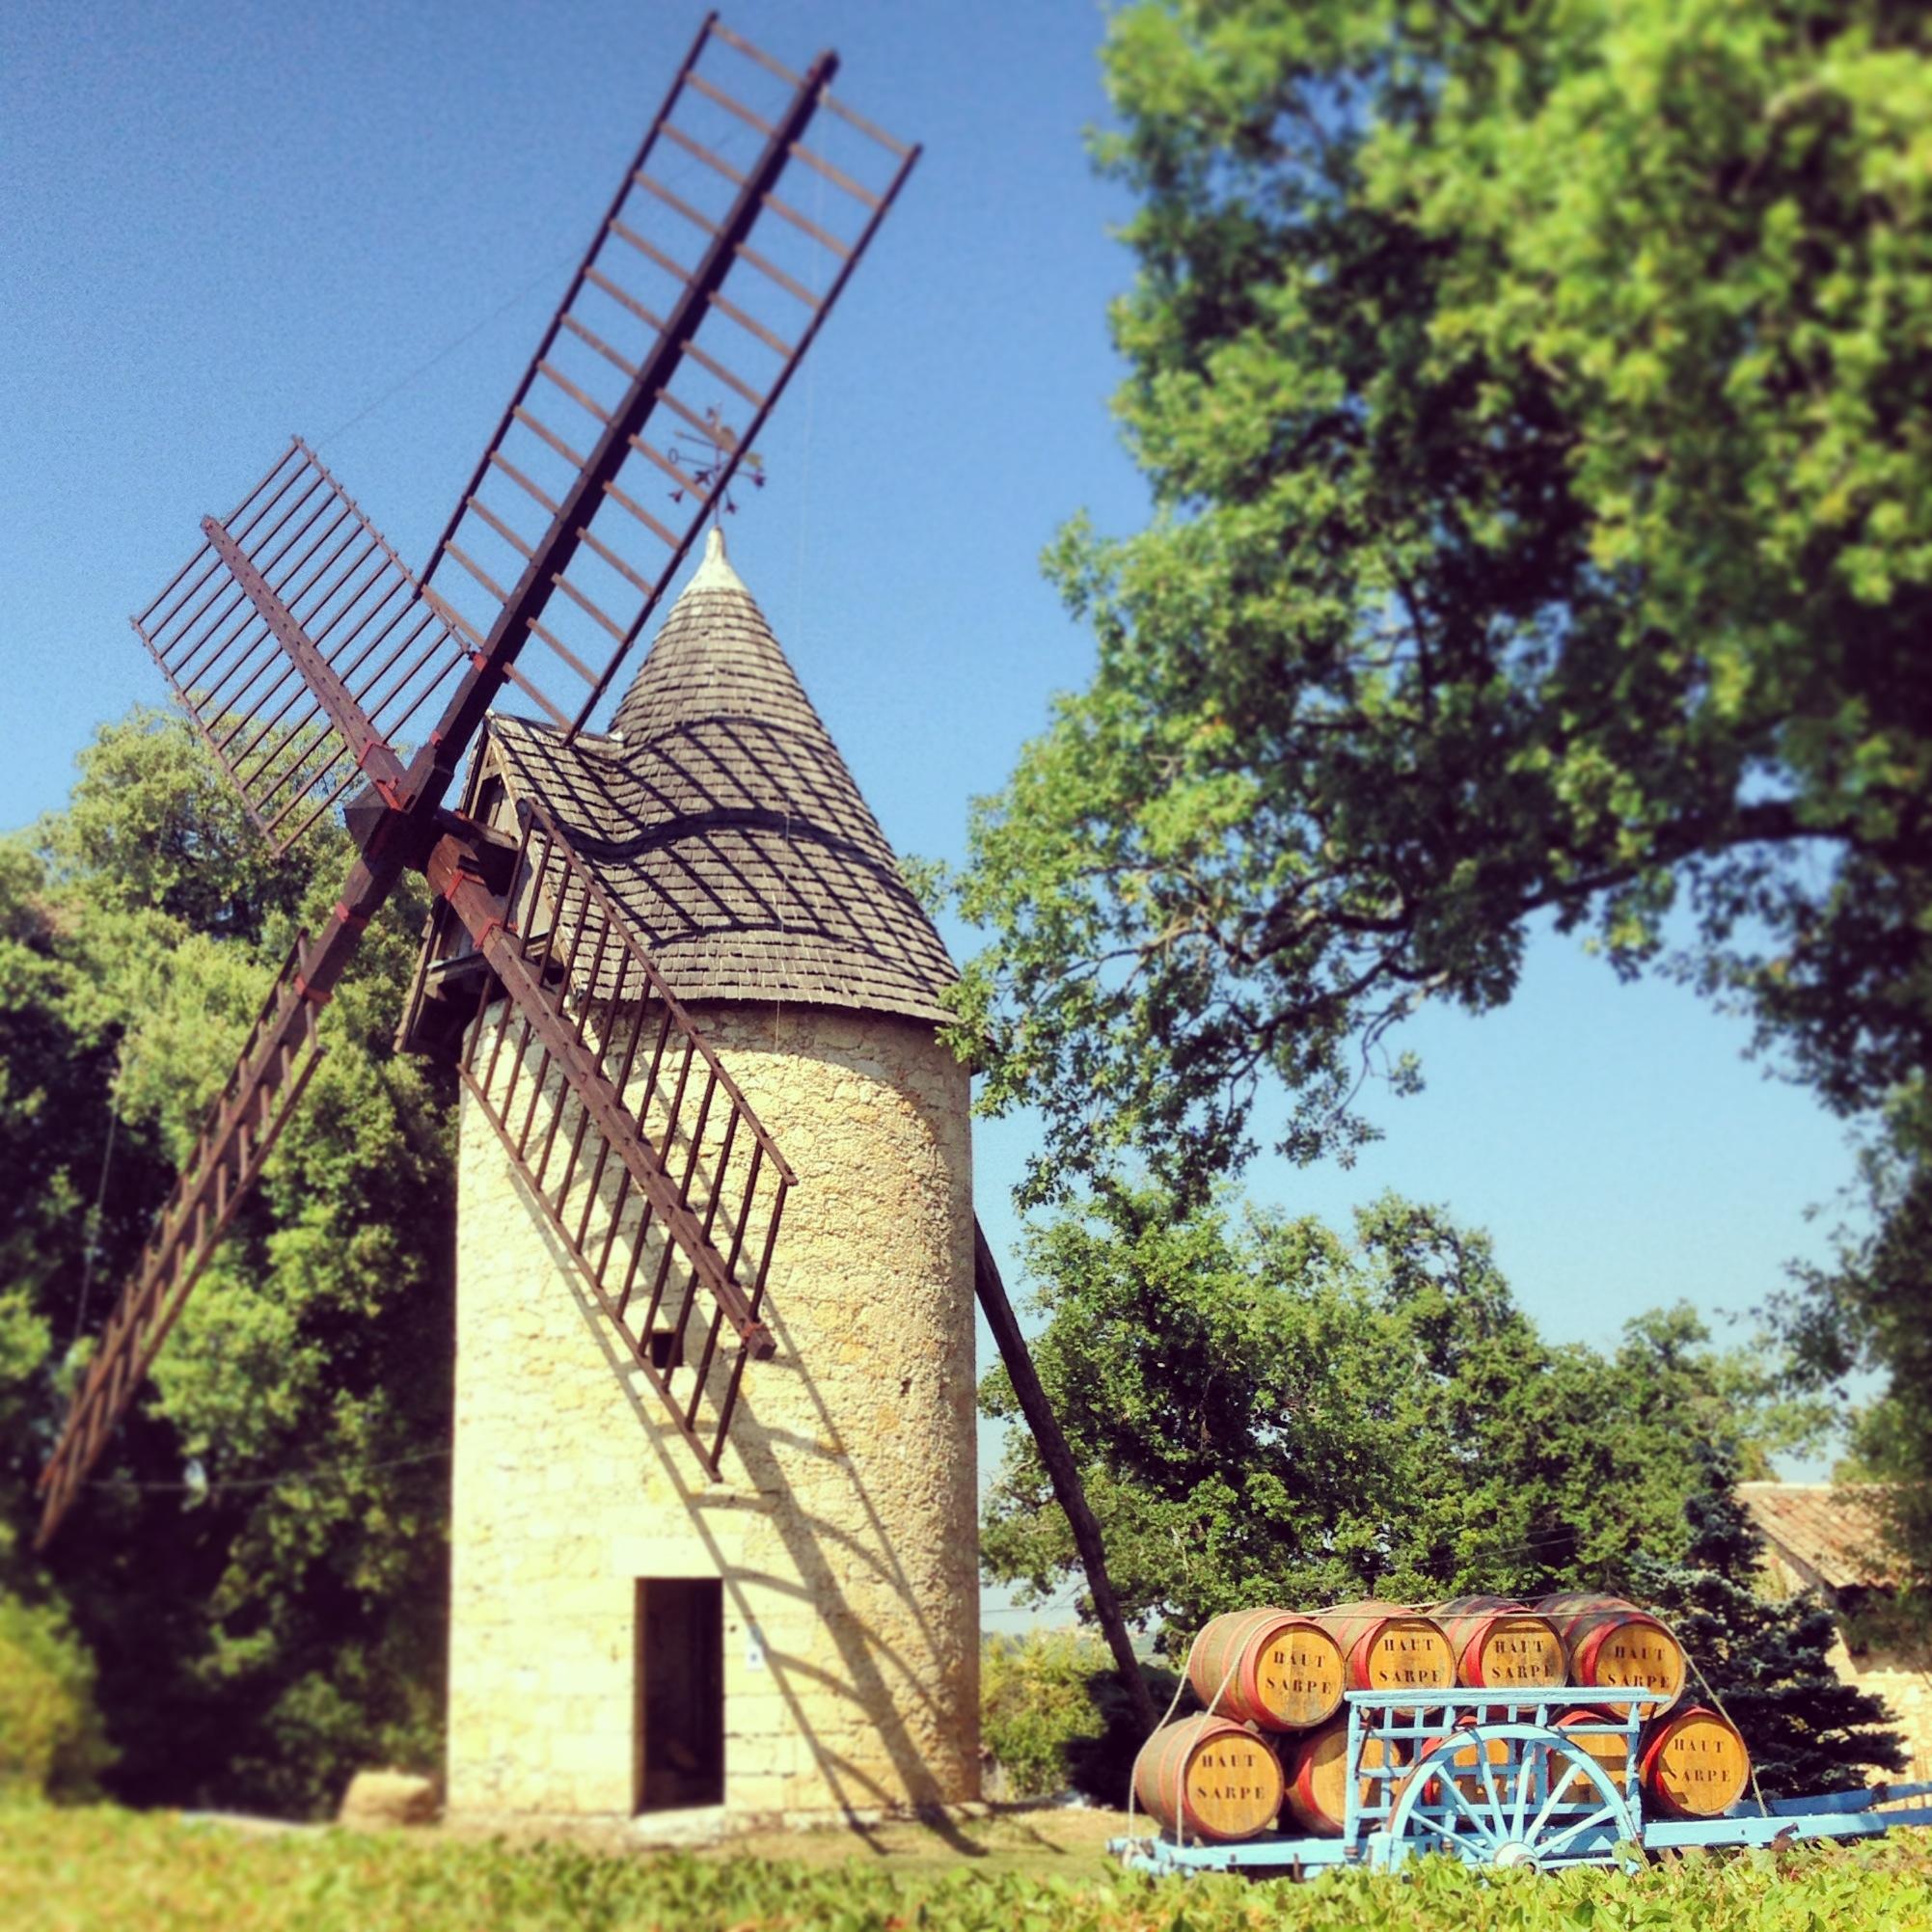 Le campagne intorno a Bordeaux